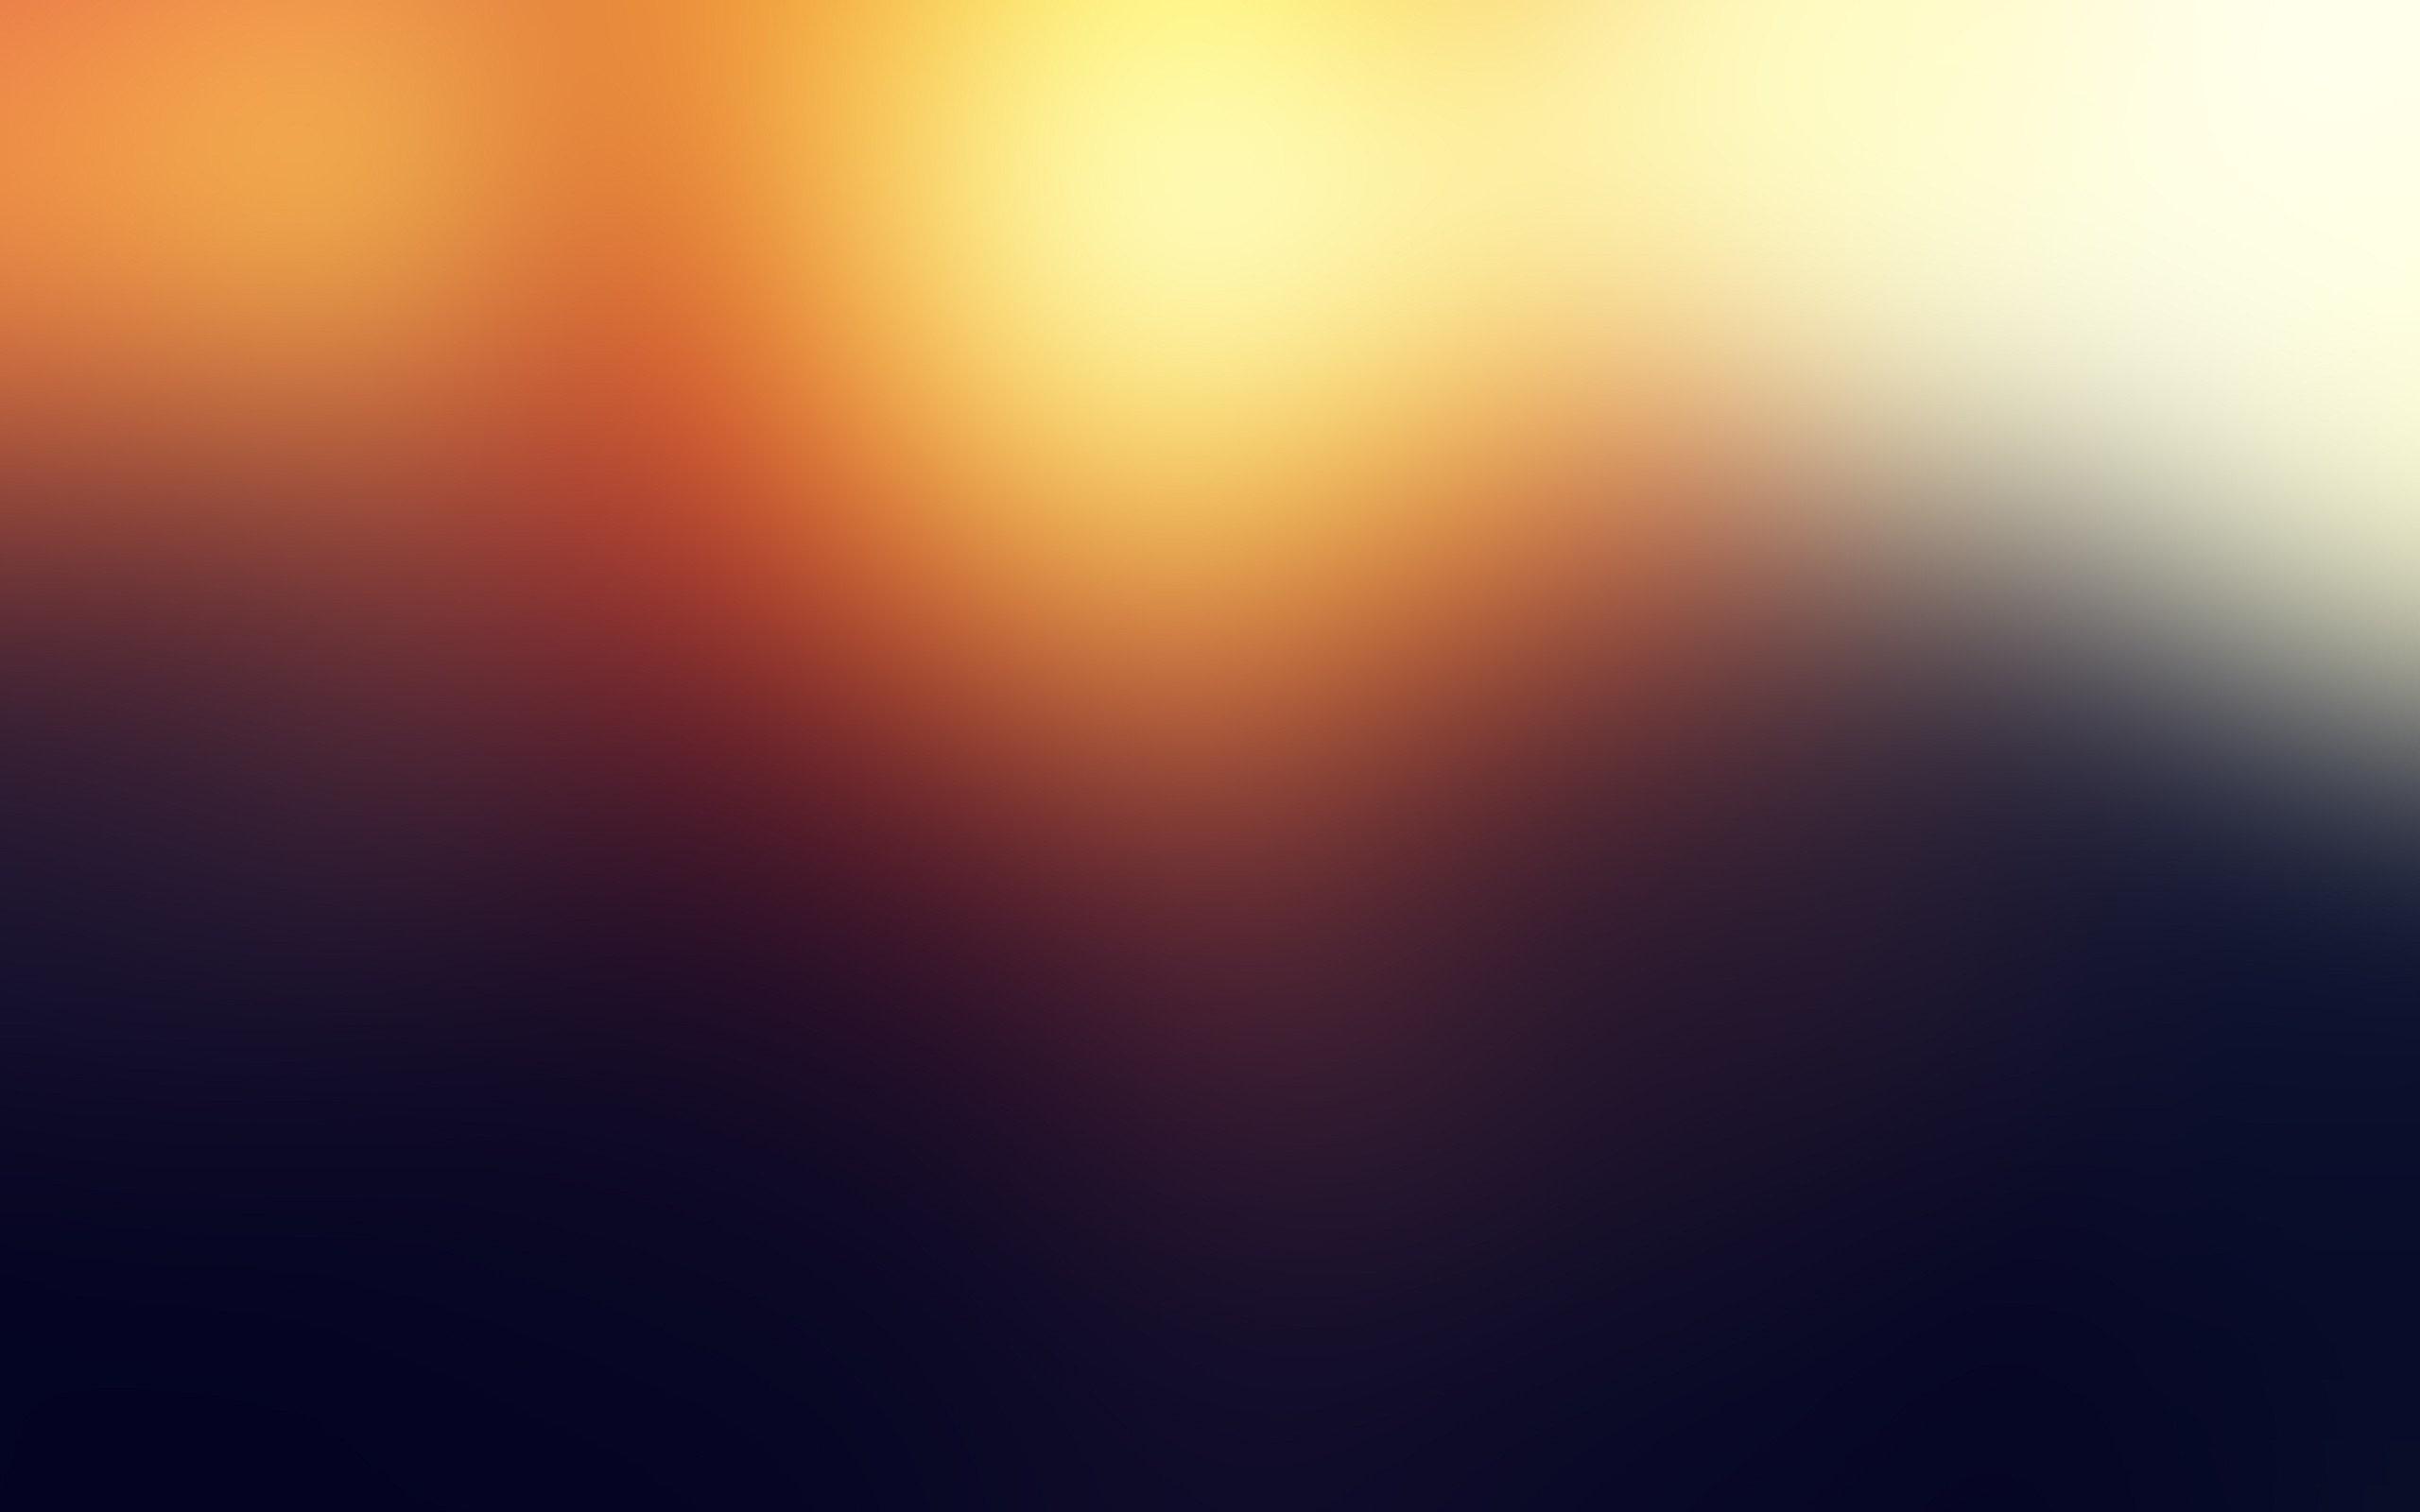 Hazy Wallpaper 41014 2560x1440 px